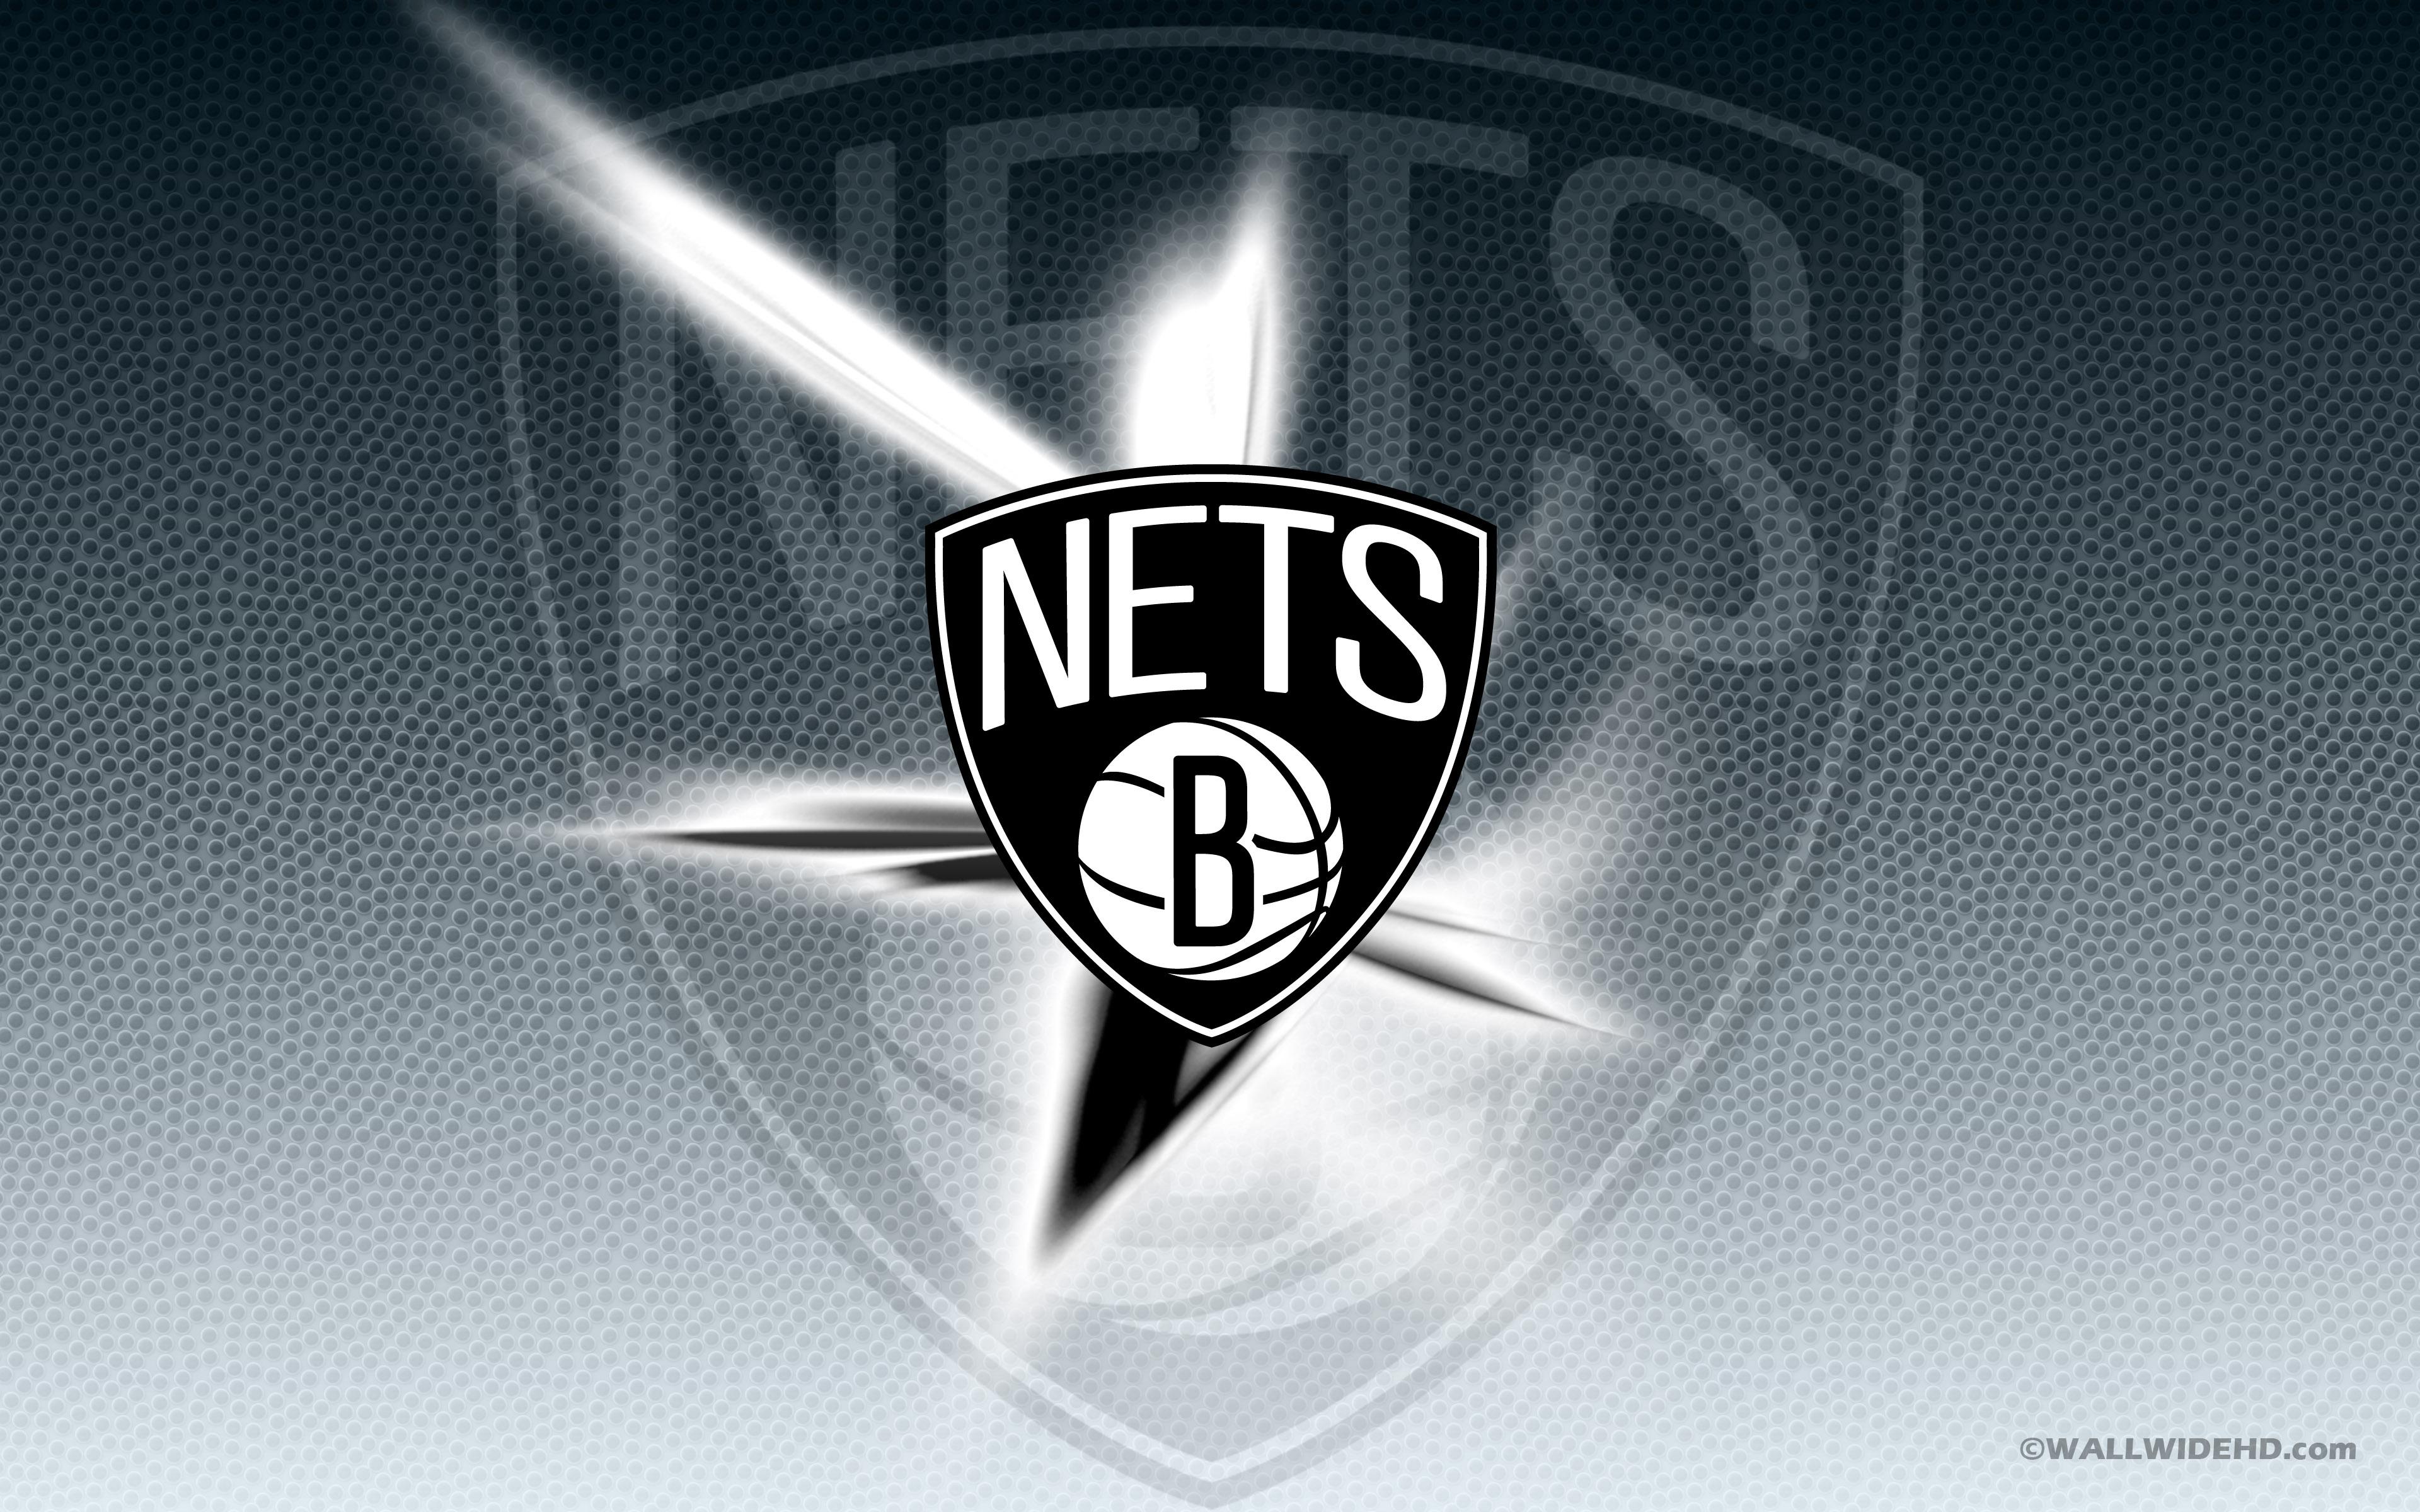 Brooklyn Nets Wallpaper Nba cute black Logo cute Wallpapers 3840x2400